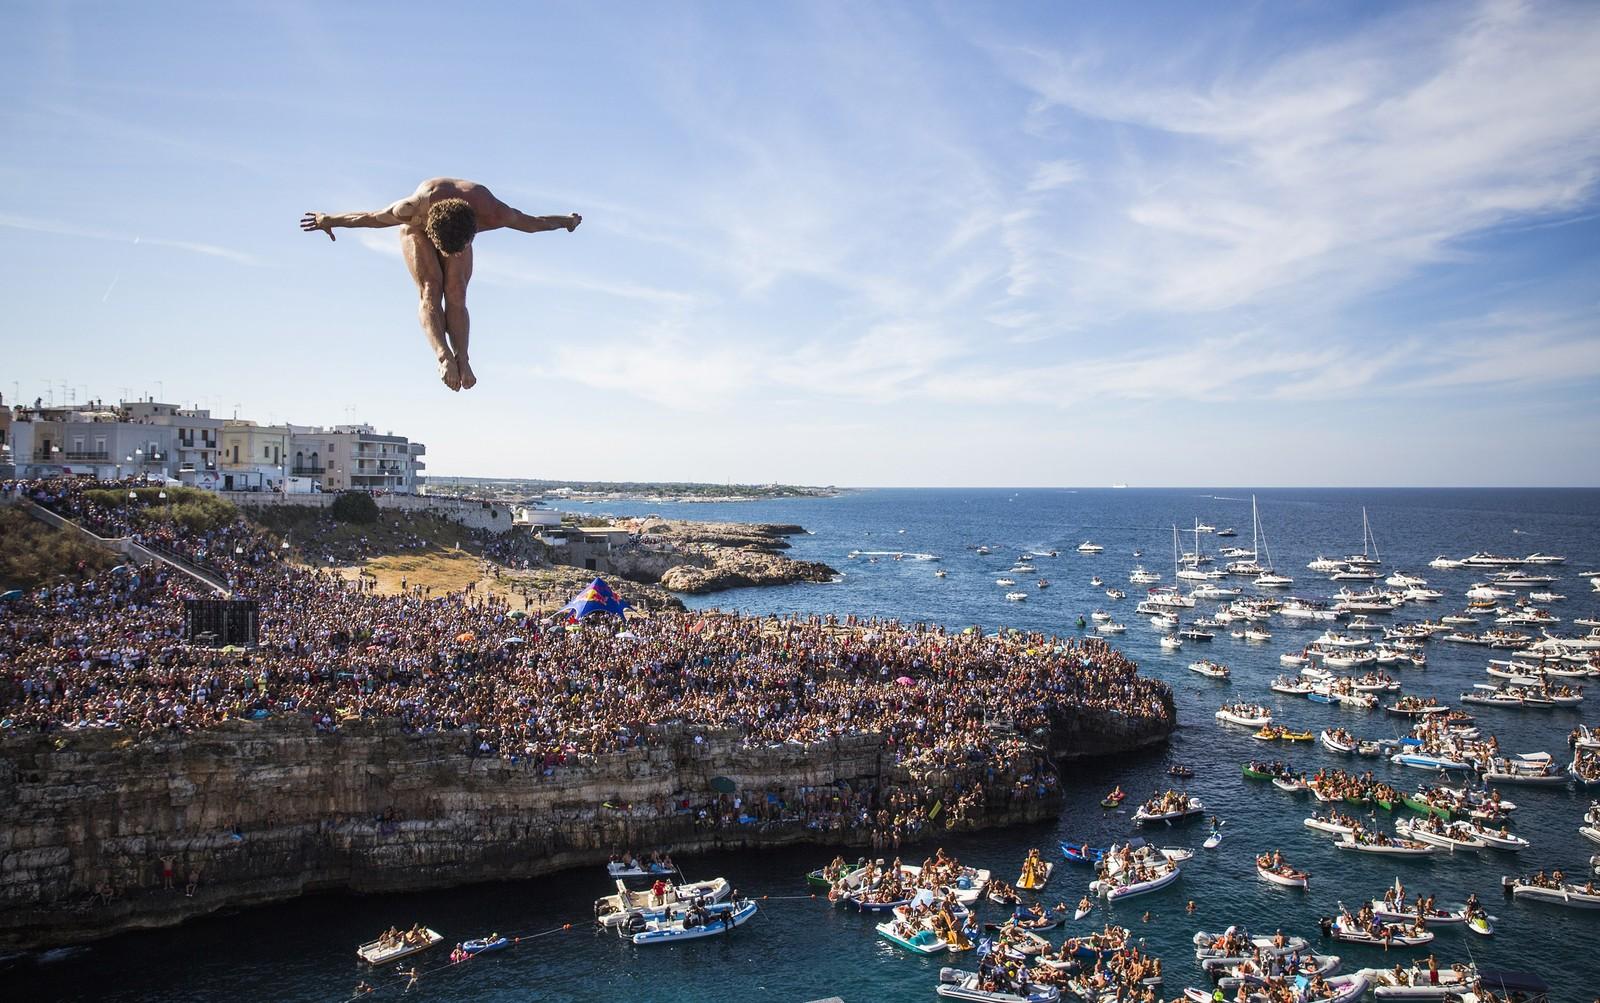 Klippestuperen David Colturi tar sats fra 27,5 meter under verdensserie-konkurransen i italienske Polignano a Mare.